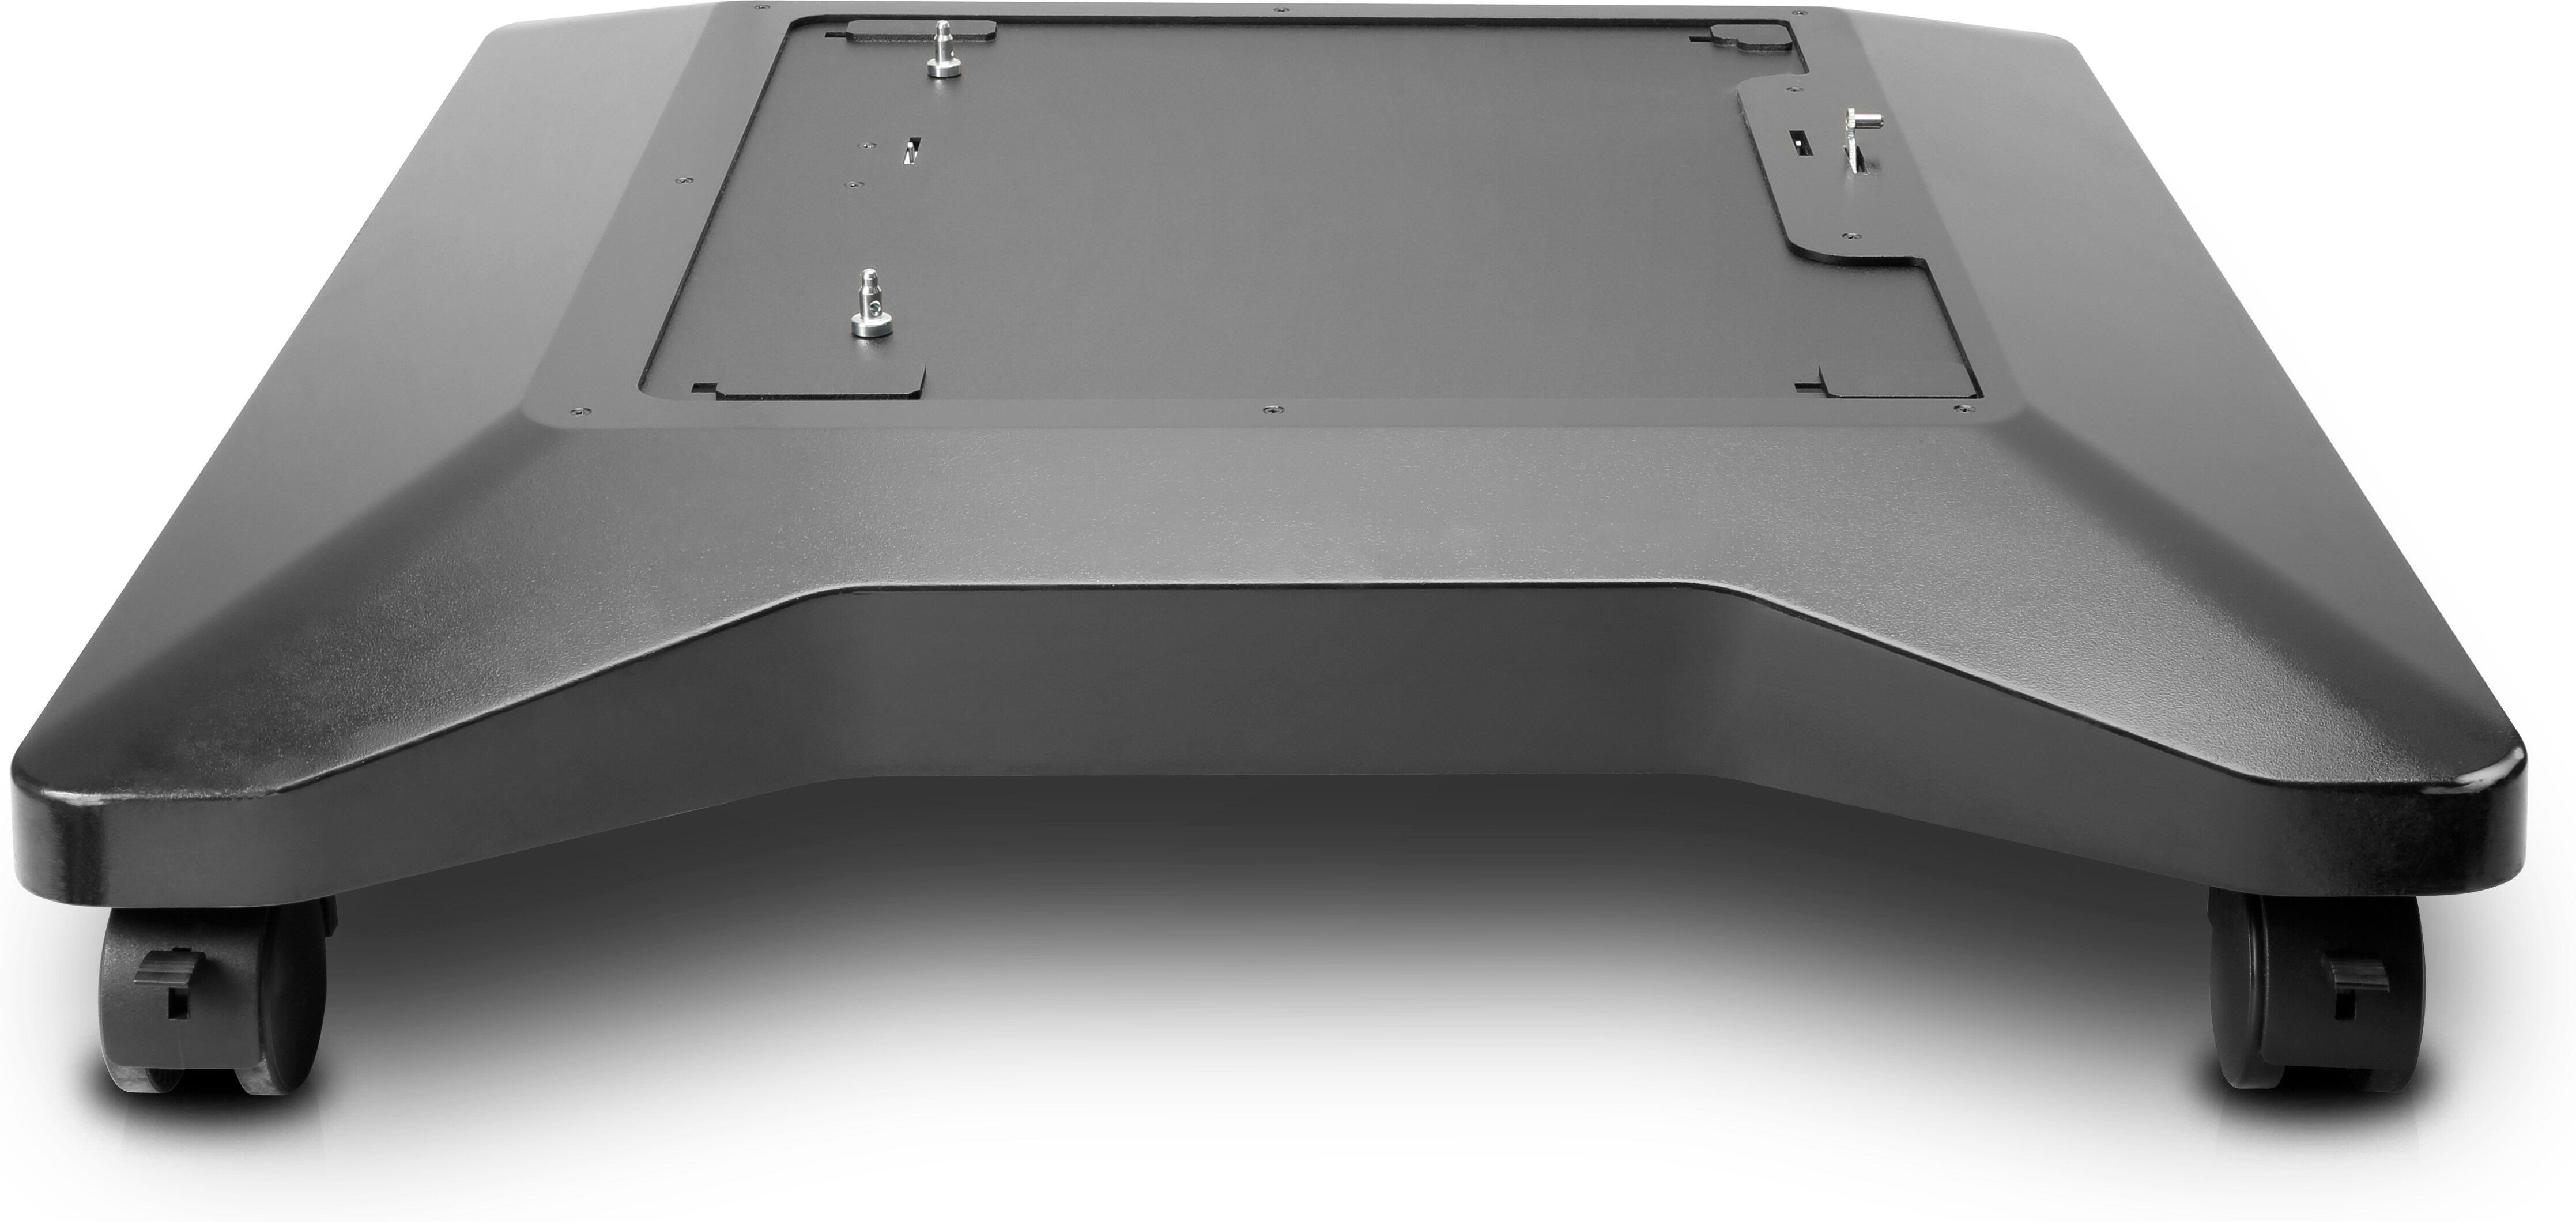 HP SUPPORTO STAMPANTE LASERJET (HP LASERJET PRINTER STAND)